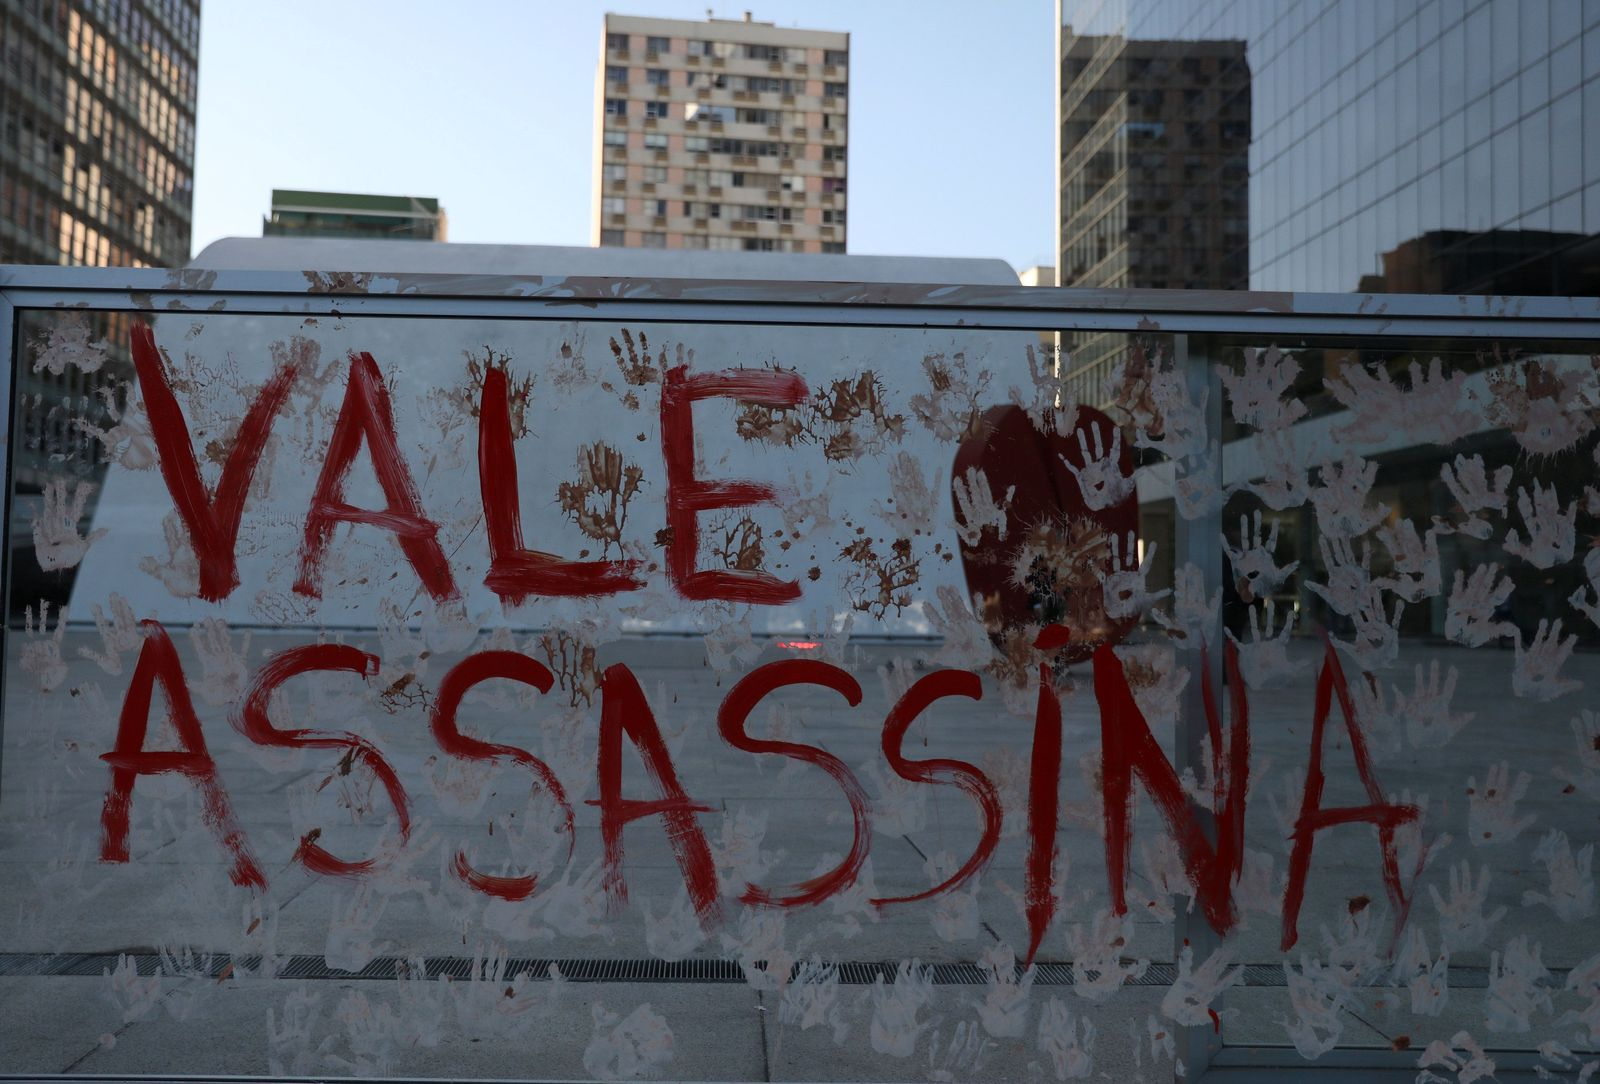 Brasilien Schlammlawine / Proteste gegen Vale